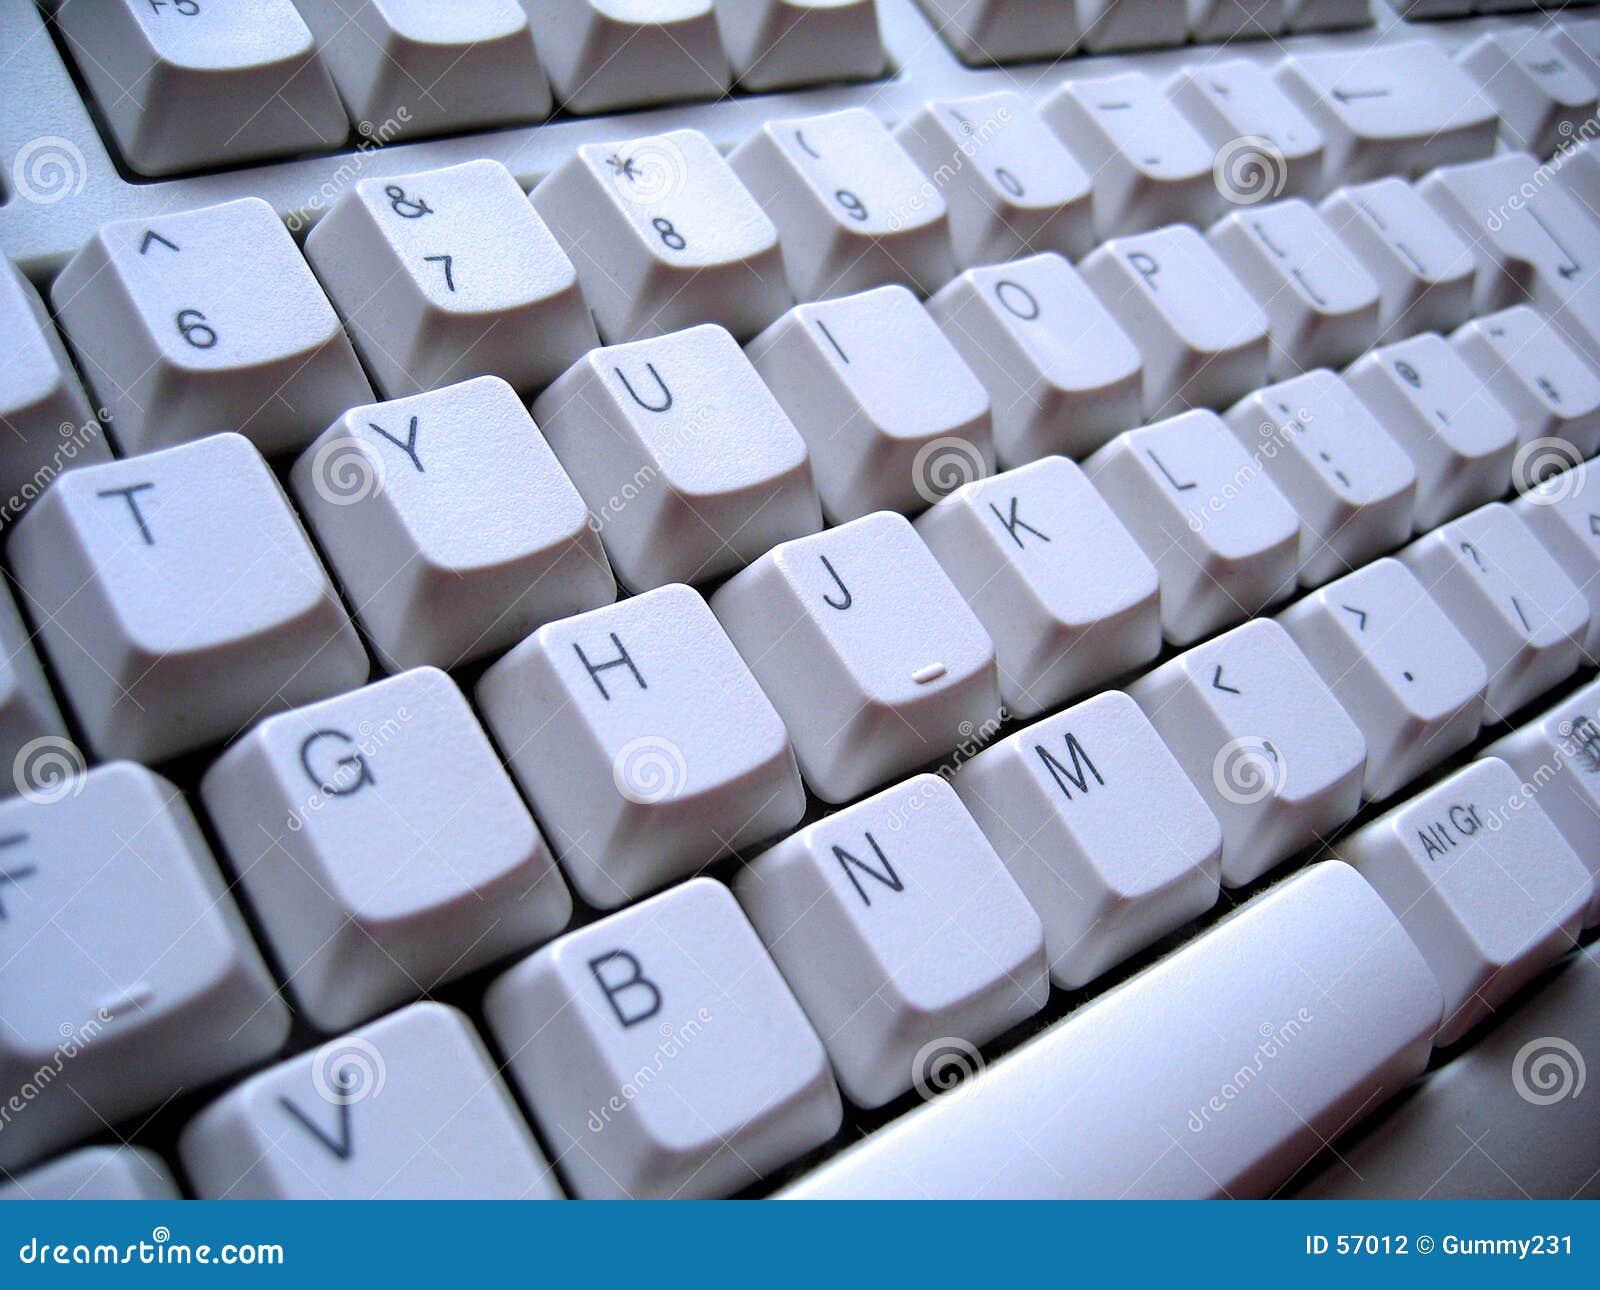 Keyboard Angle